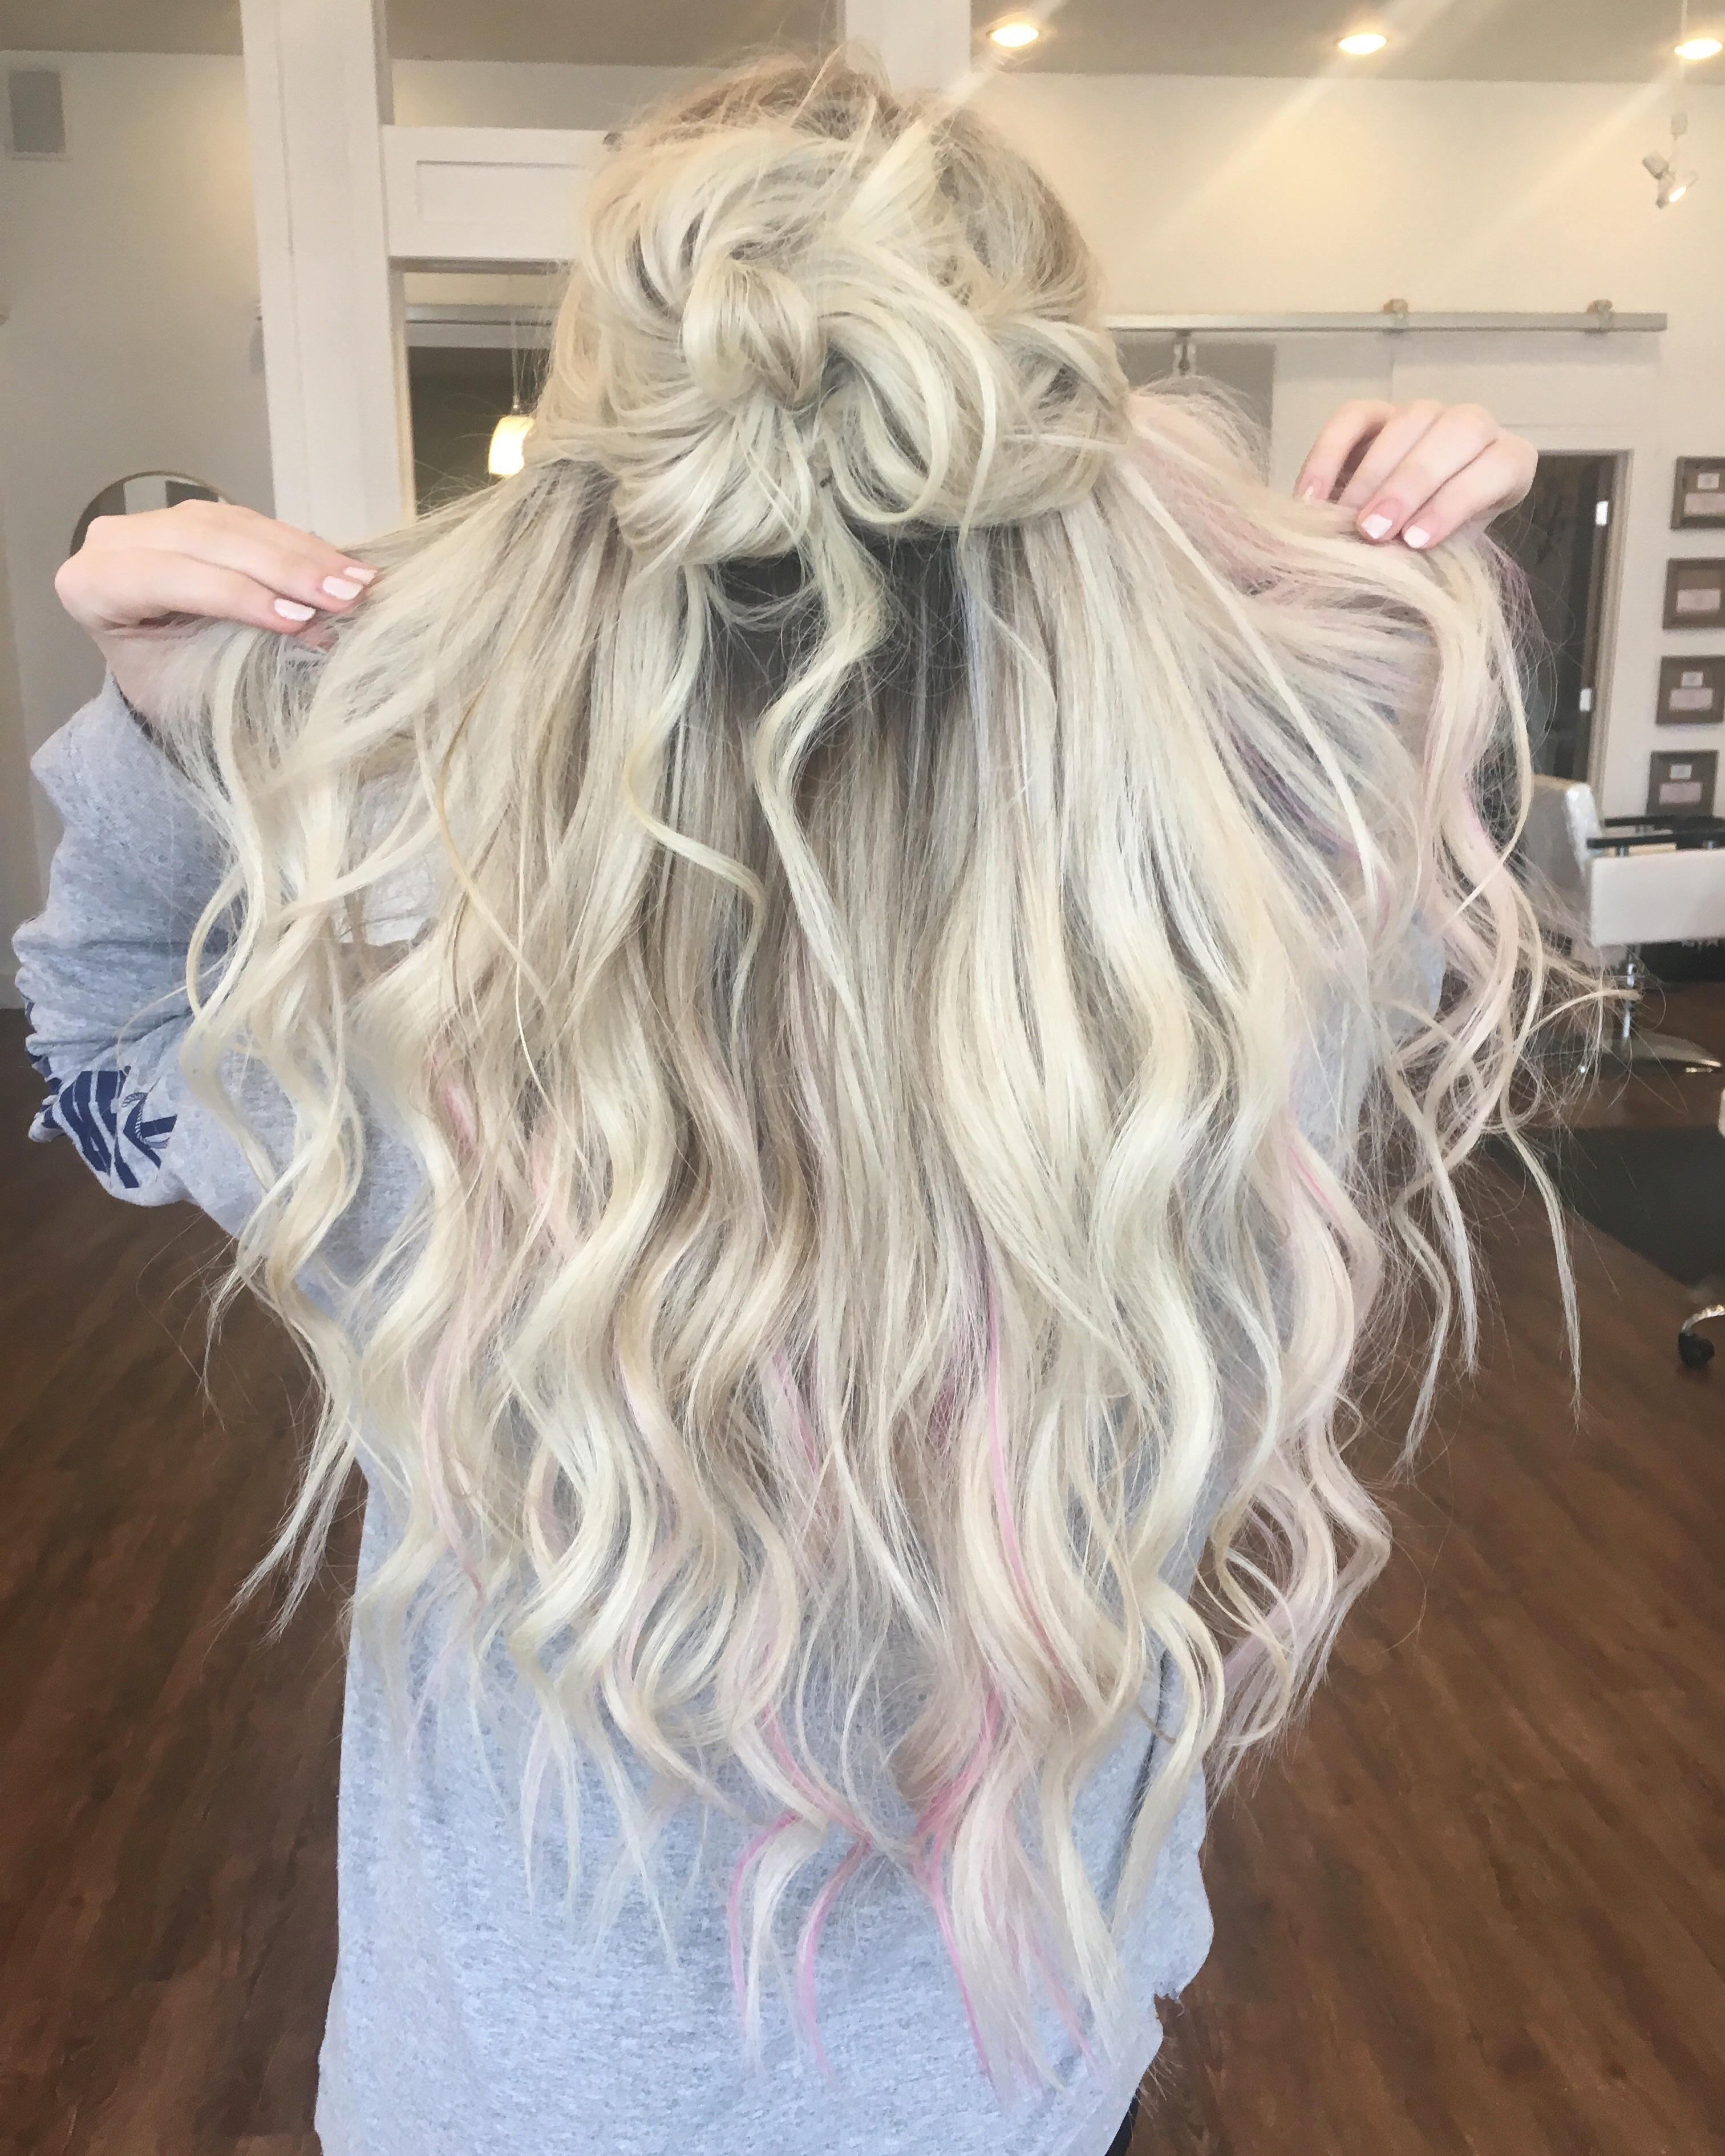 Peek A Boo Pink Highlights Hair Beauty Skin Deals Me Fashion